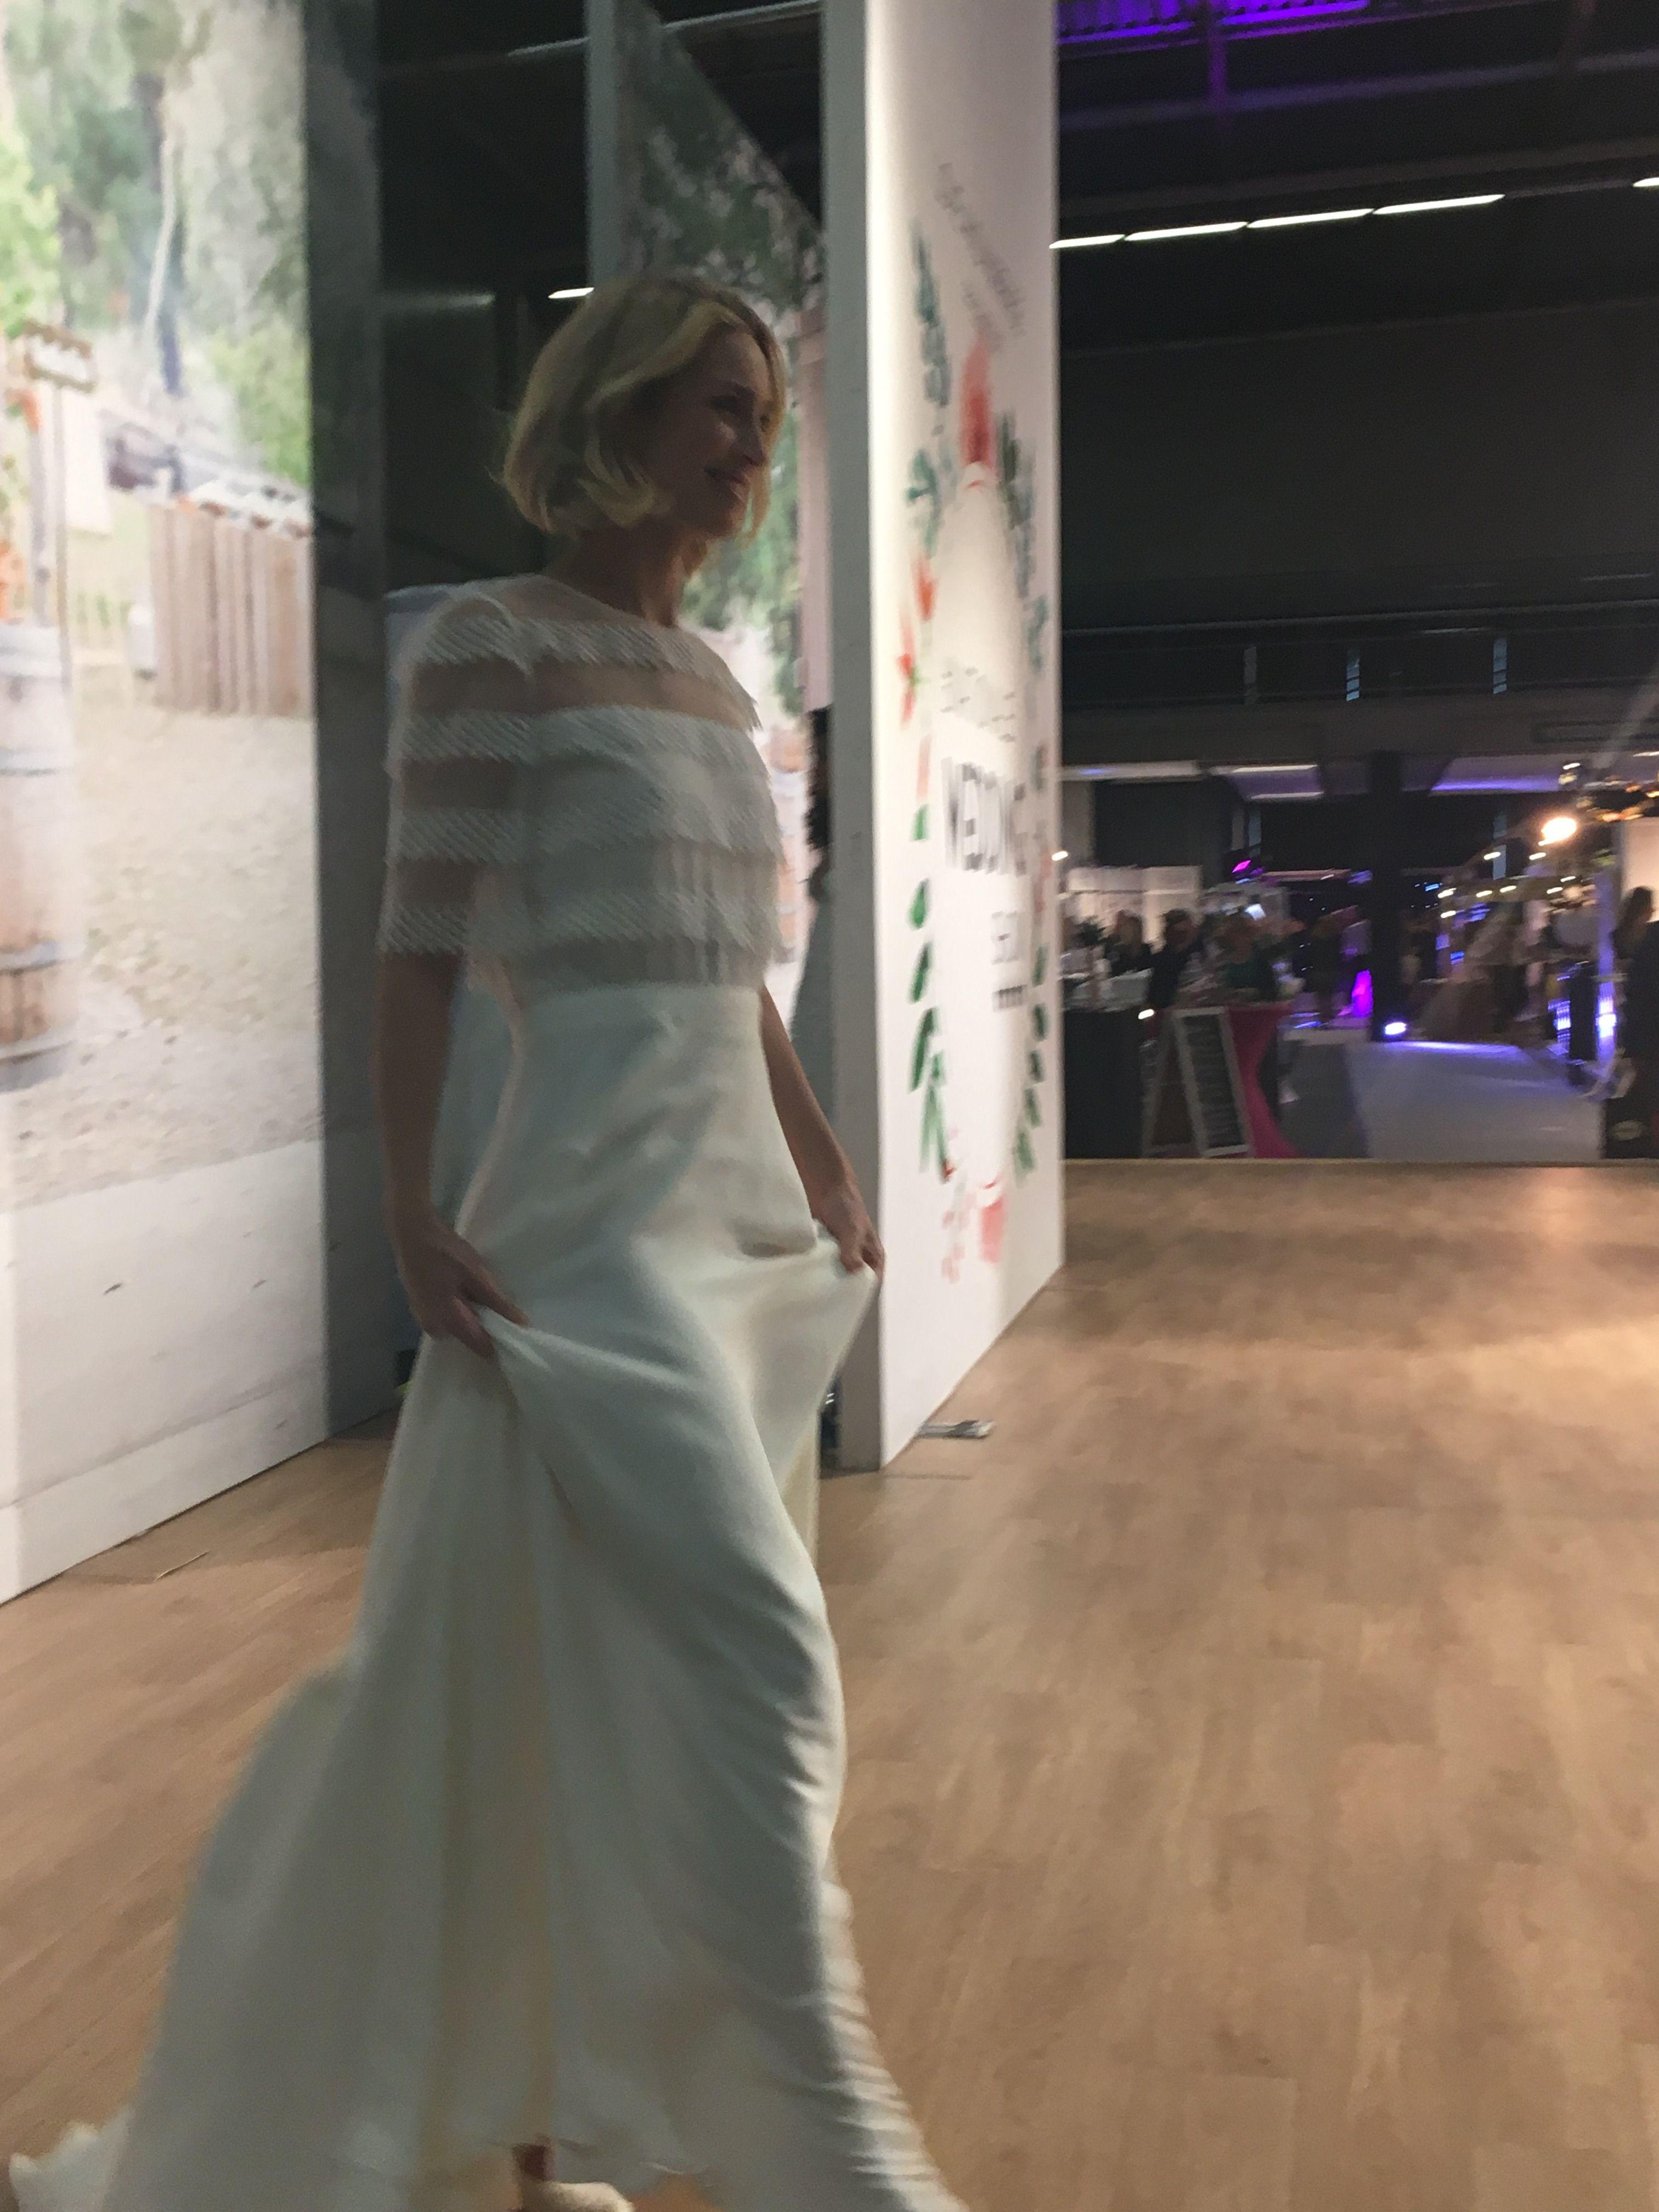 Premiere du Monde gown by Donatelle Godart